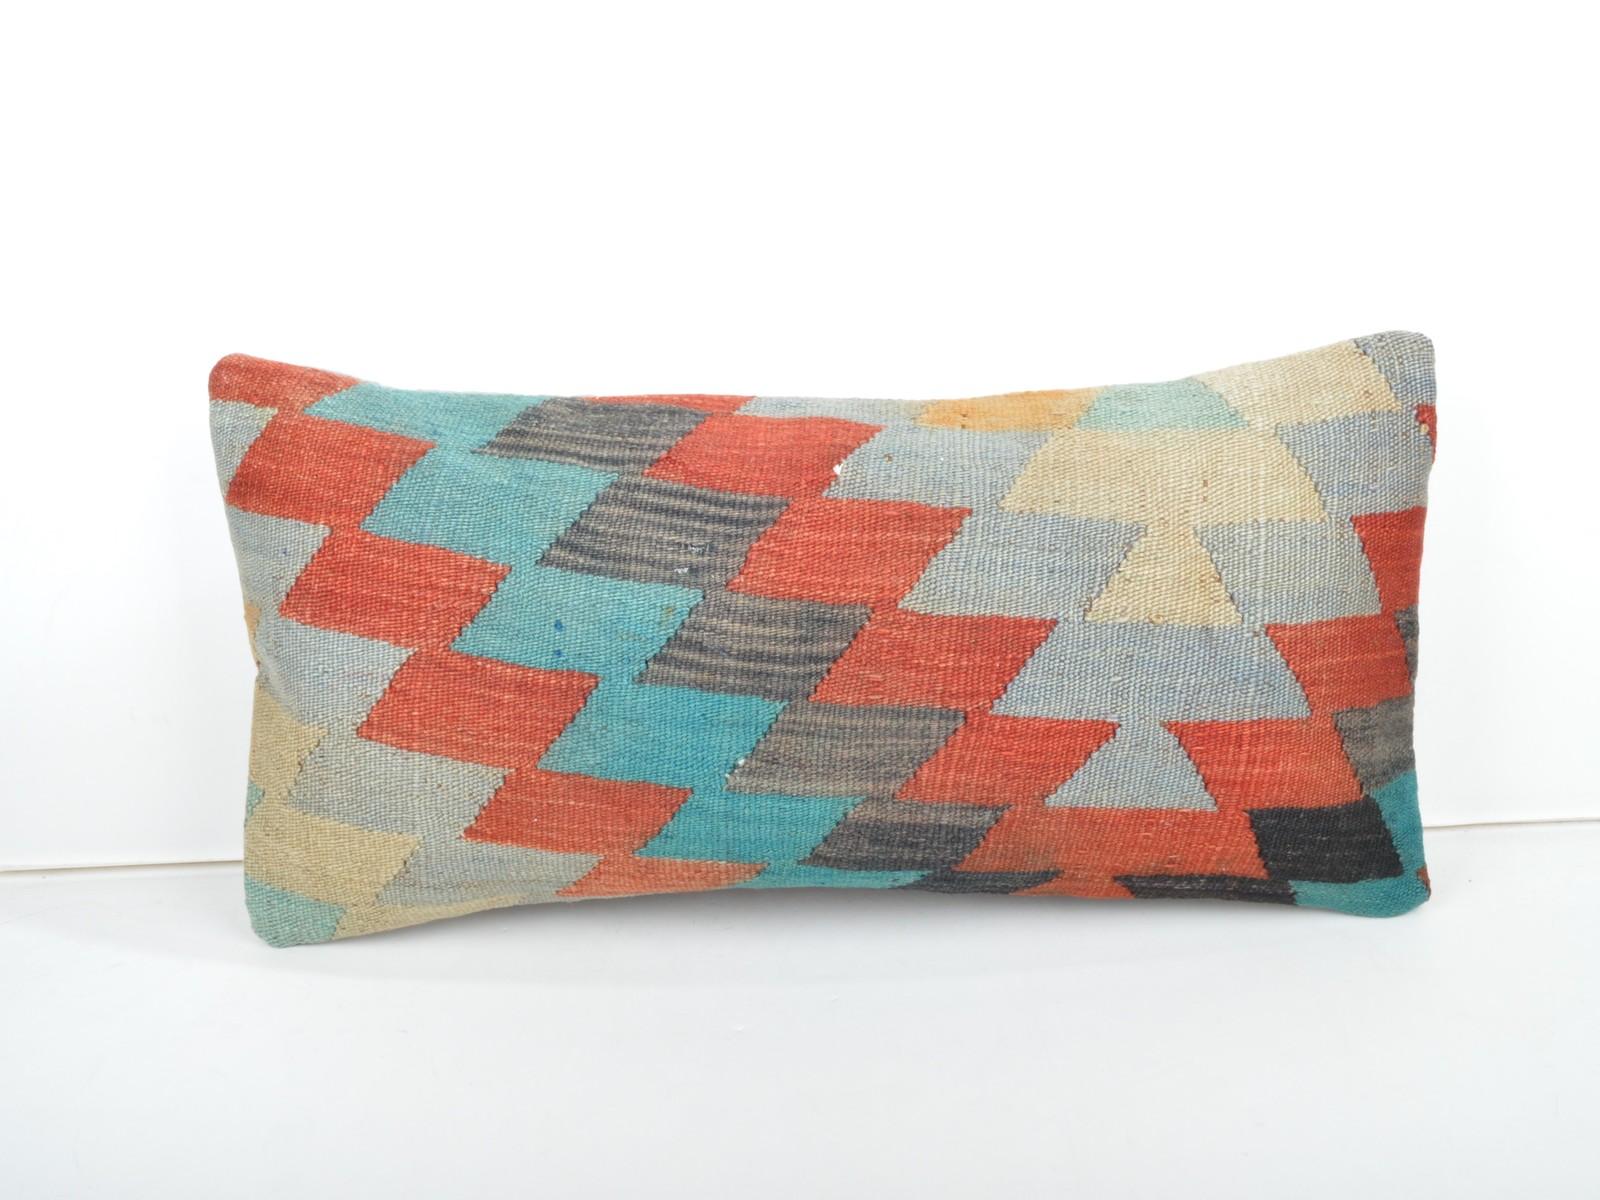 kilim pillow,lumbar kilim pillow,lumbar cushion,kilim cushion,pillow case,30x60  - $39.00